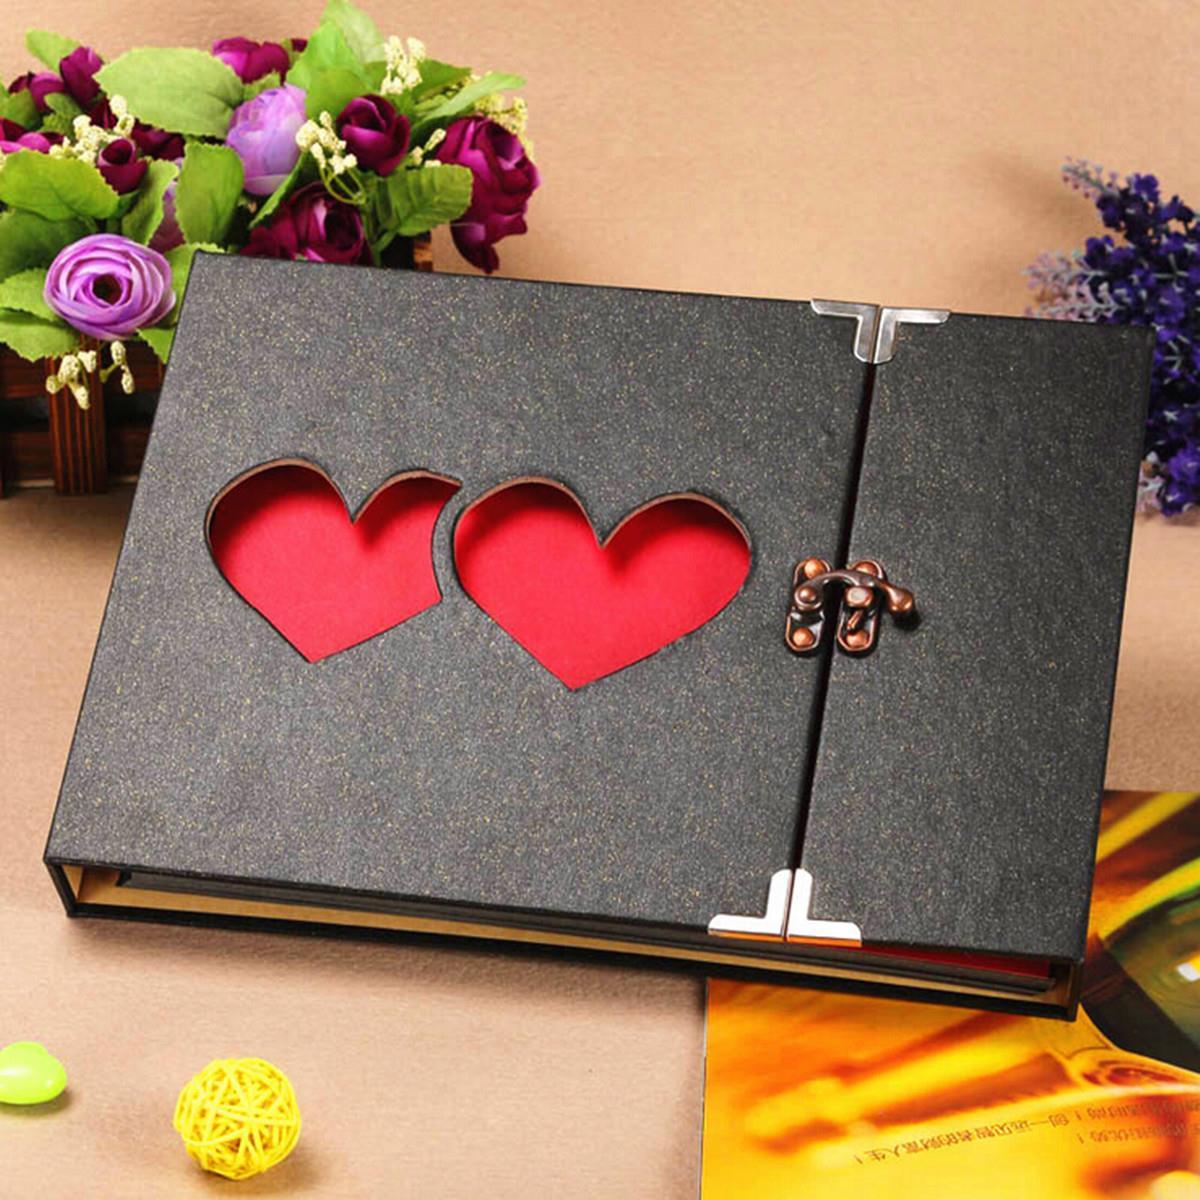 How to make scrapbook paper at home -  Paper Metal Gallery Diy Photo Album In Download